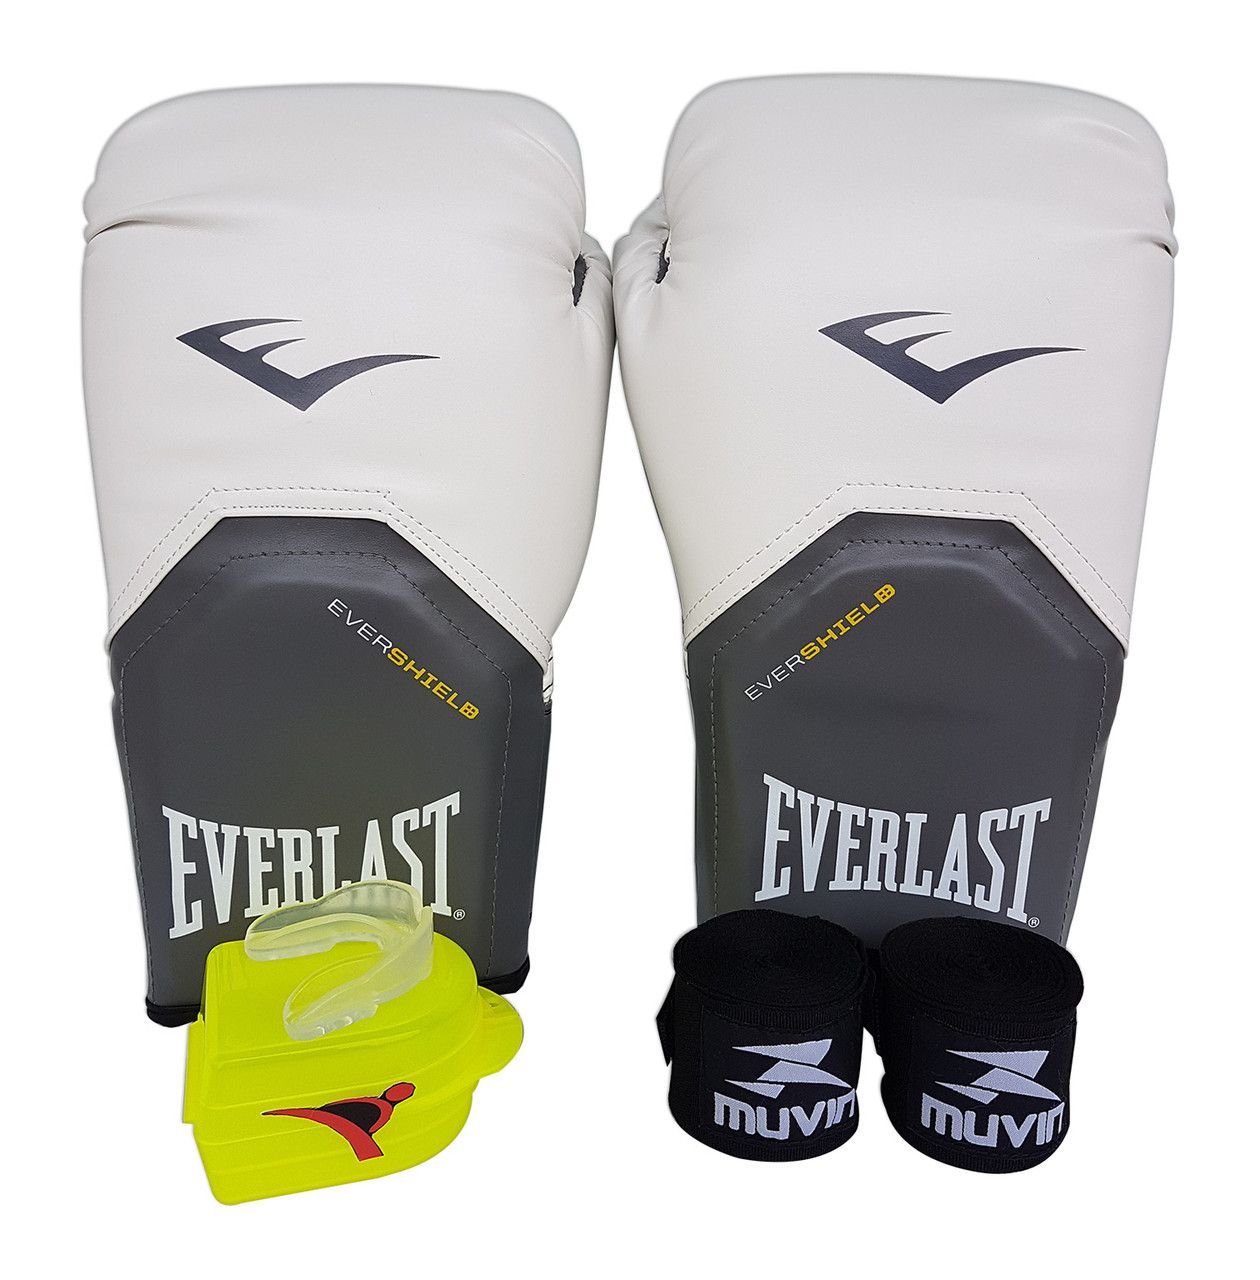 Kit de Boxe   Muay Thai 12oz - Branco - Pro Style - Everlast - PRALUTA ... 421bdd0d58d88